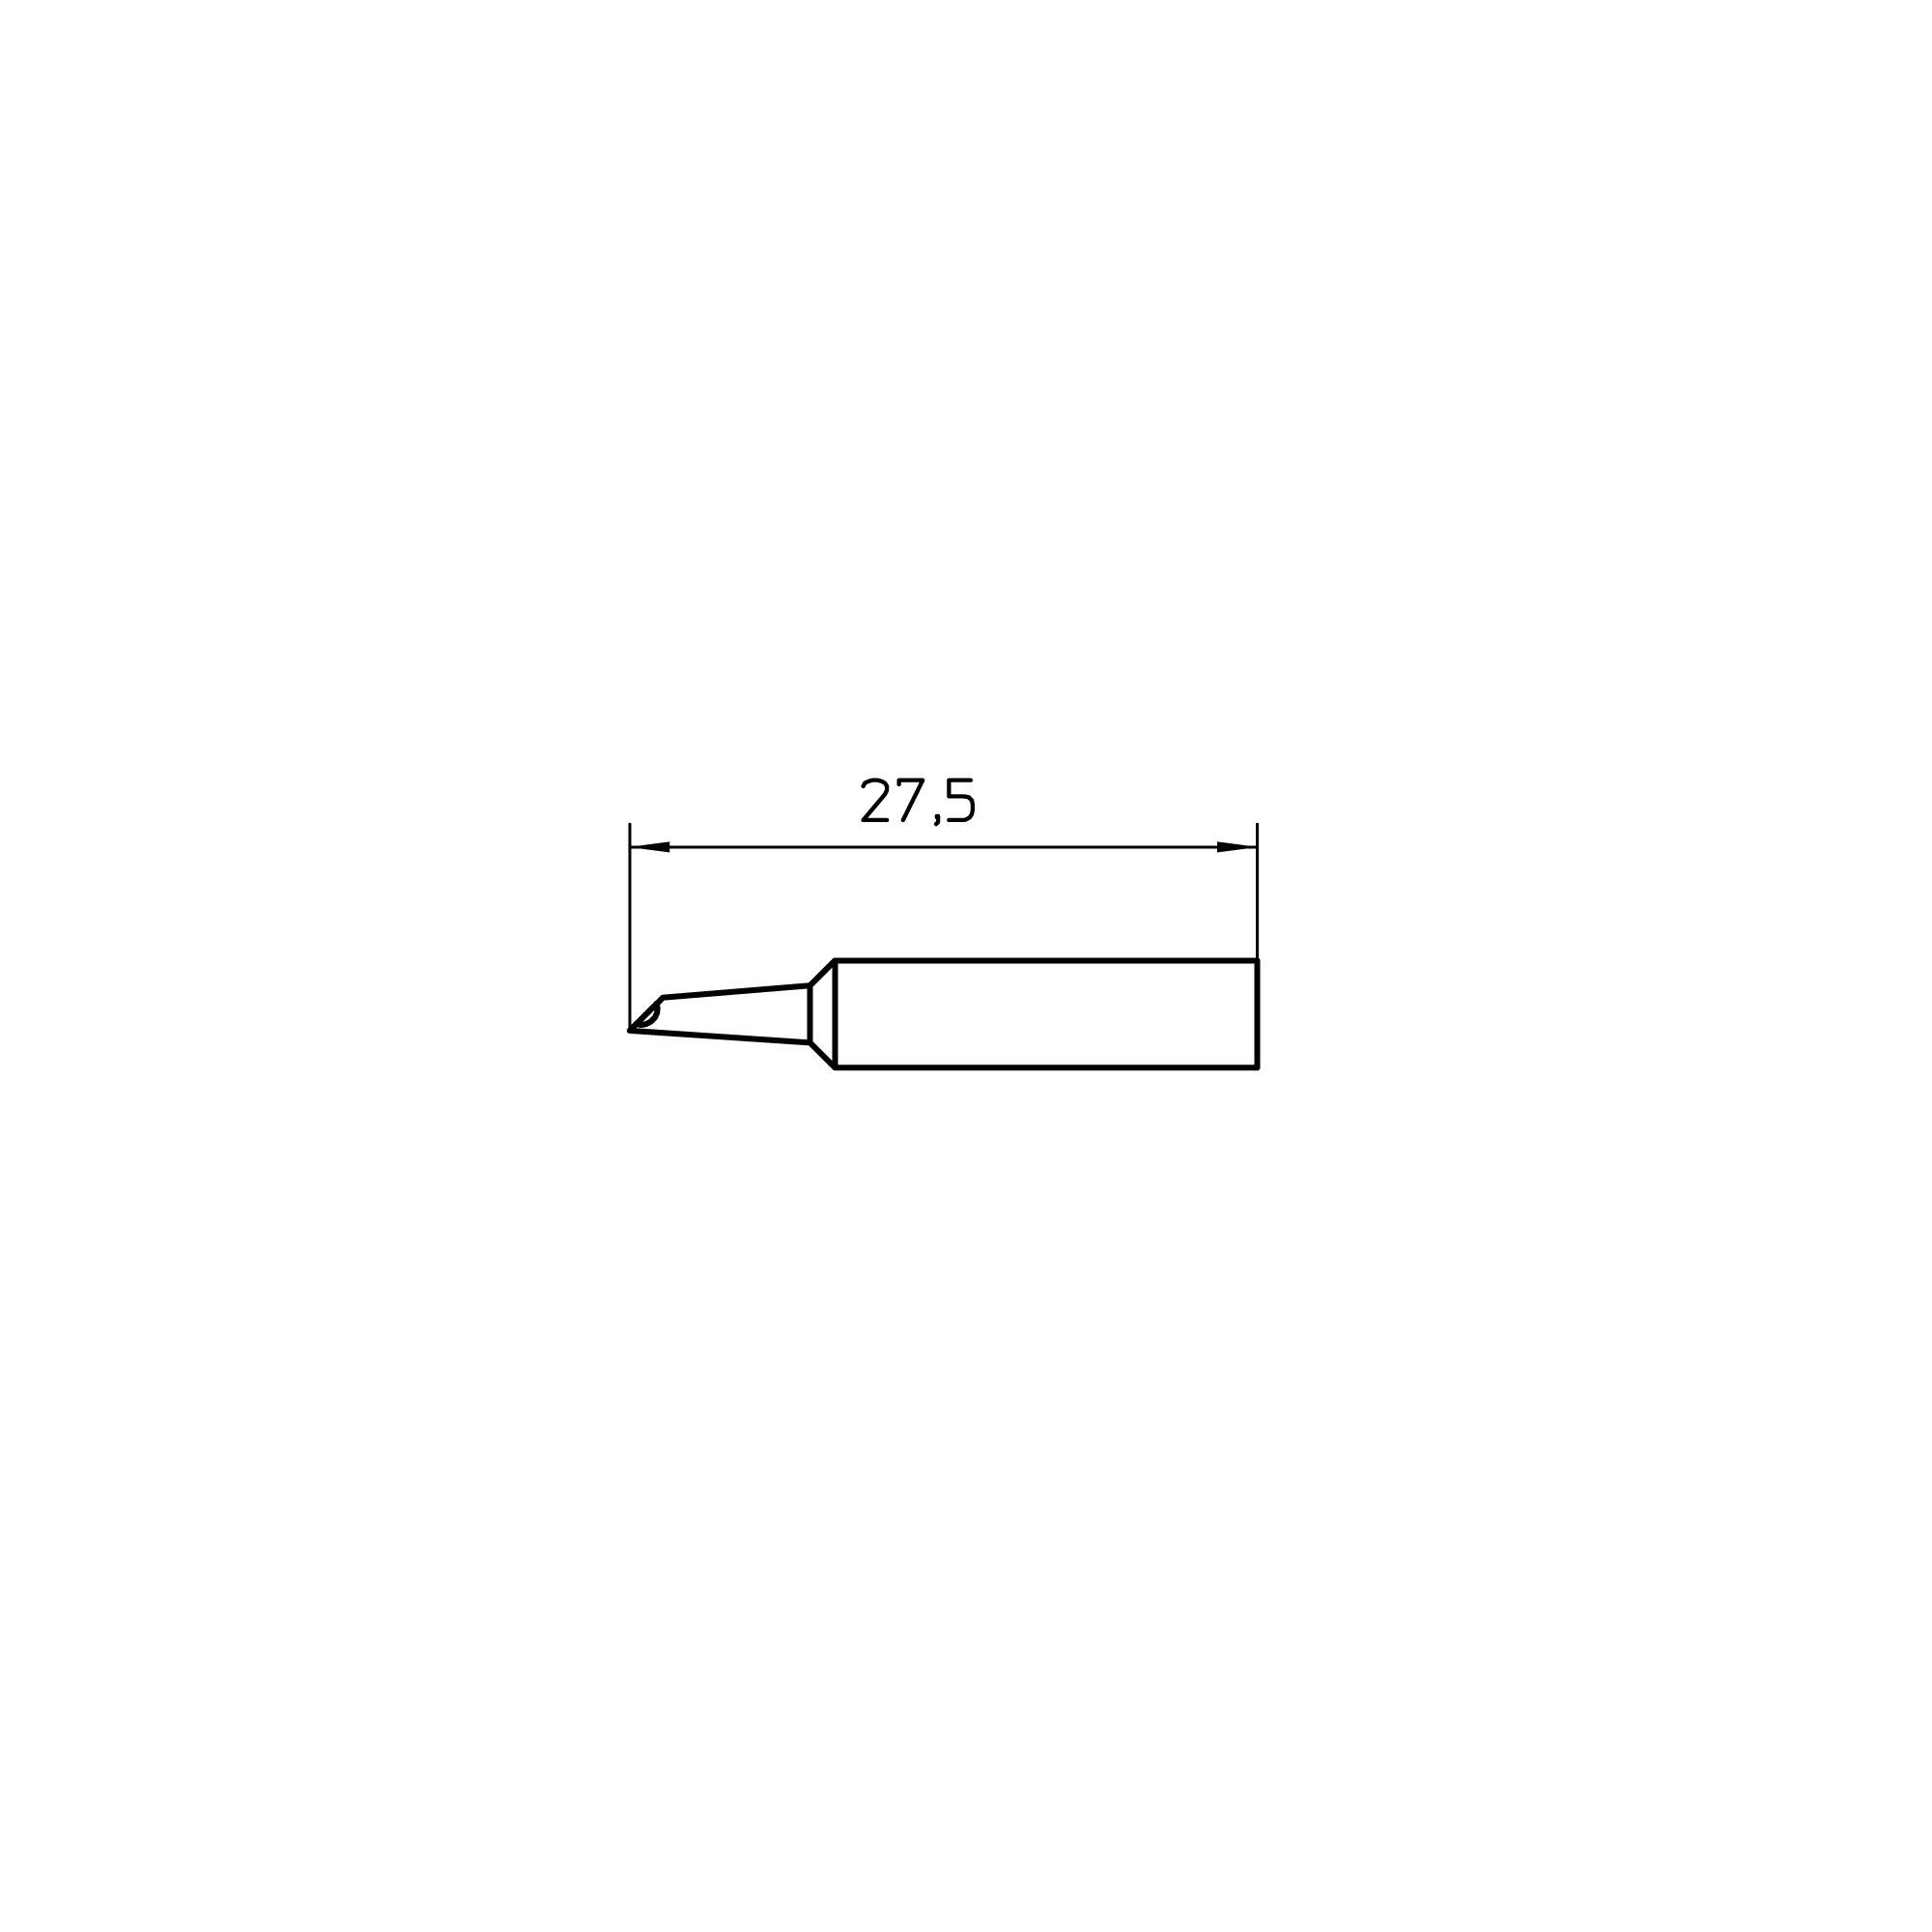 XNT GW2 SHORT (10 pcs.) Soldering tip